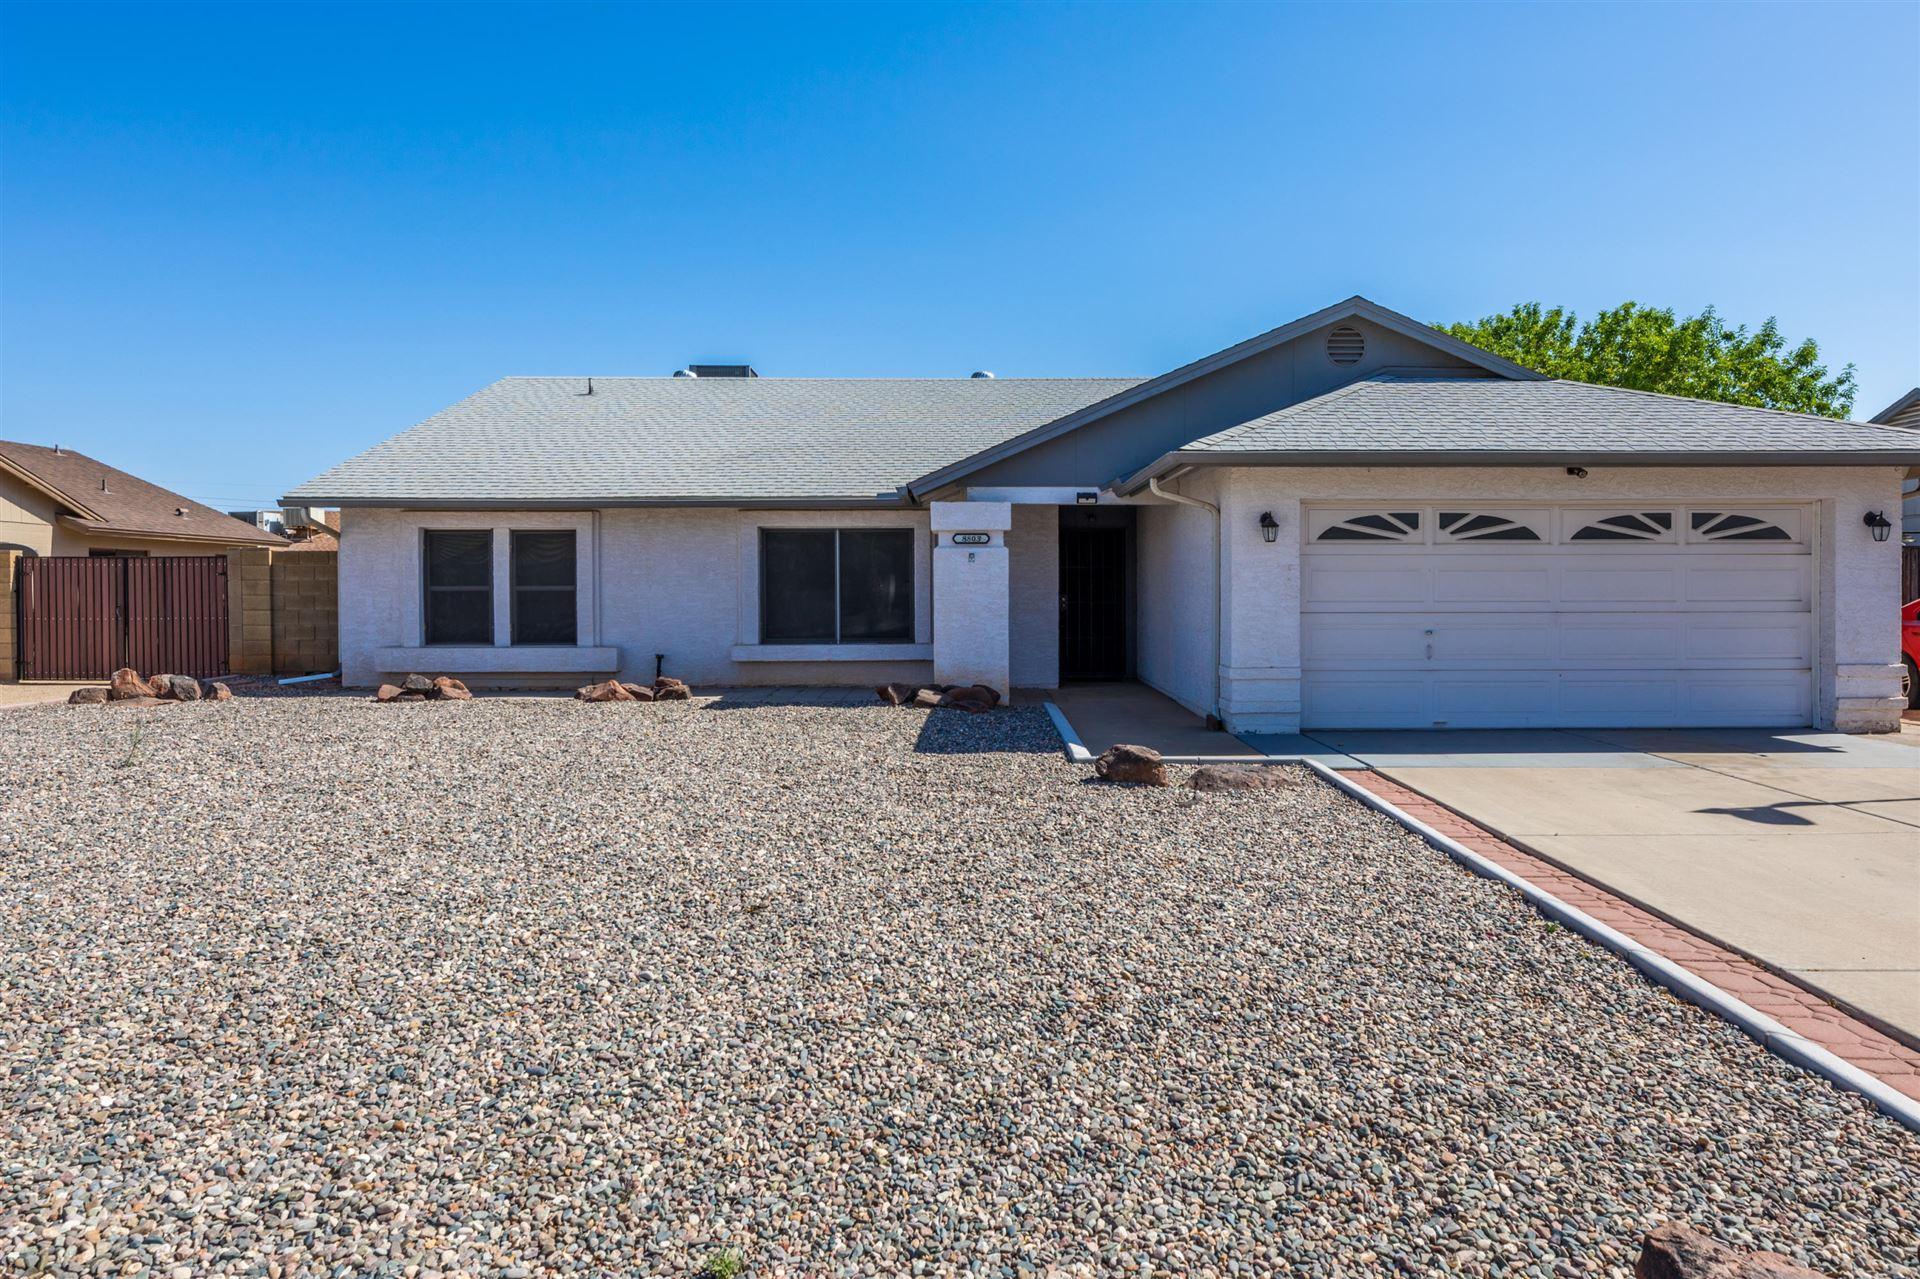 Photo of 8803 W Orchid Lane, Peoria, AZ 85345 (MLS # 6247187)